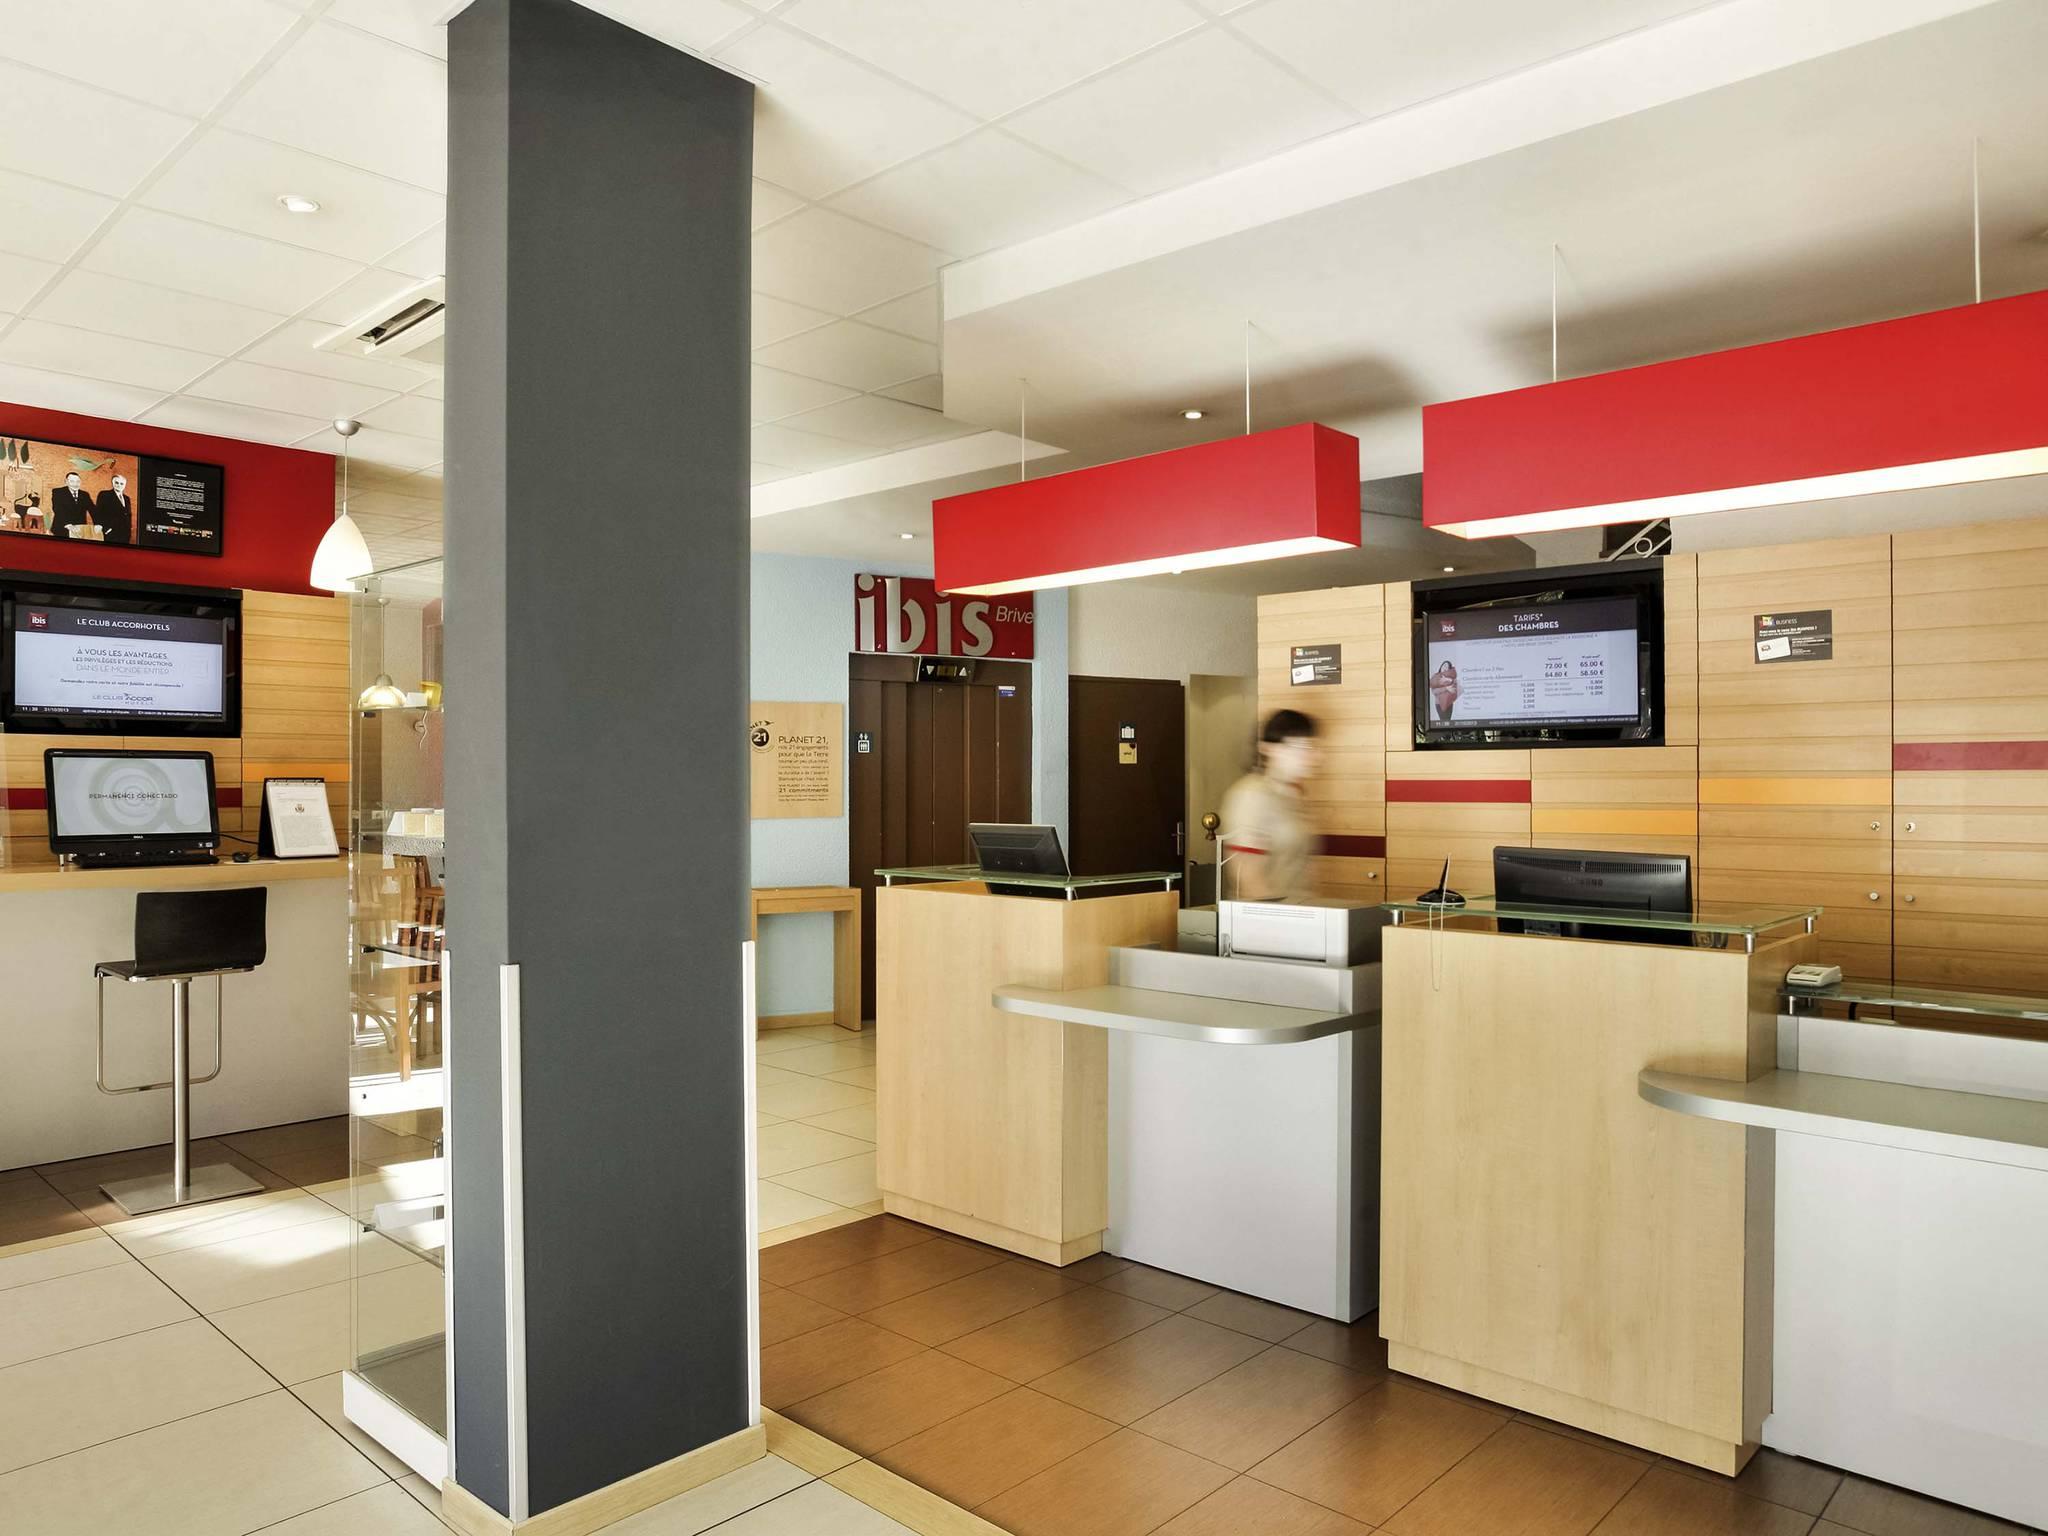 Hotel – ibis Brive Centre